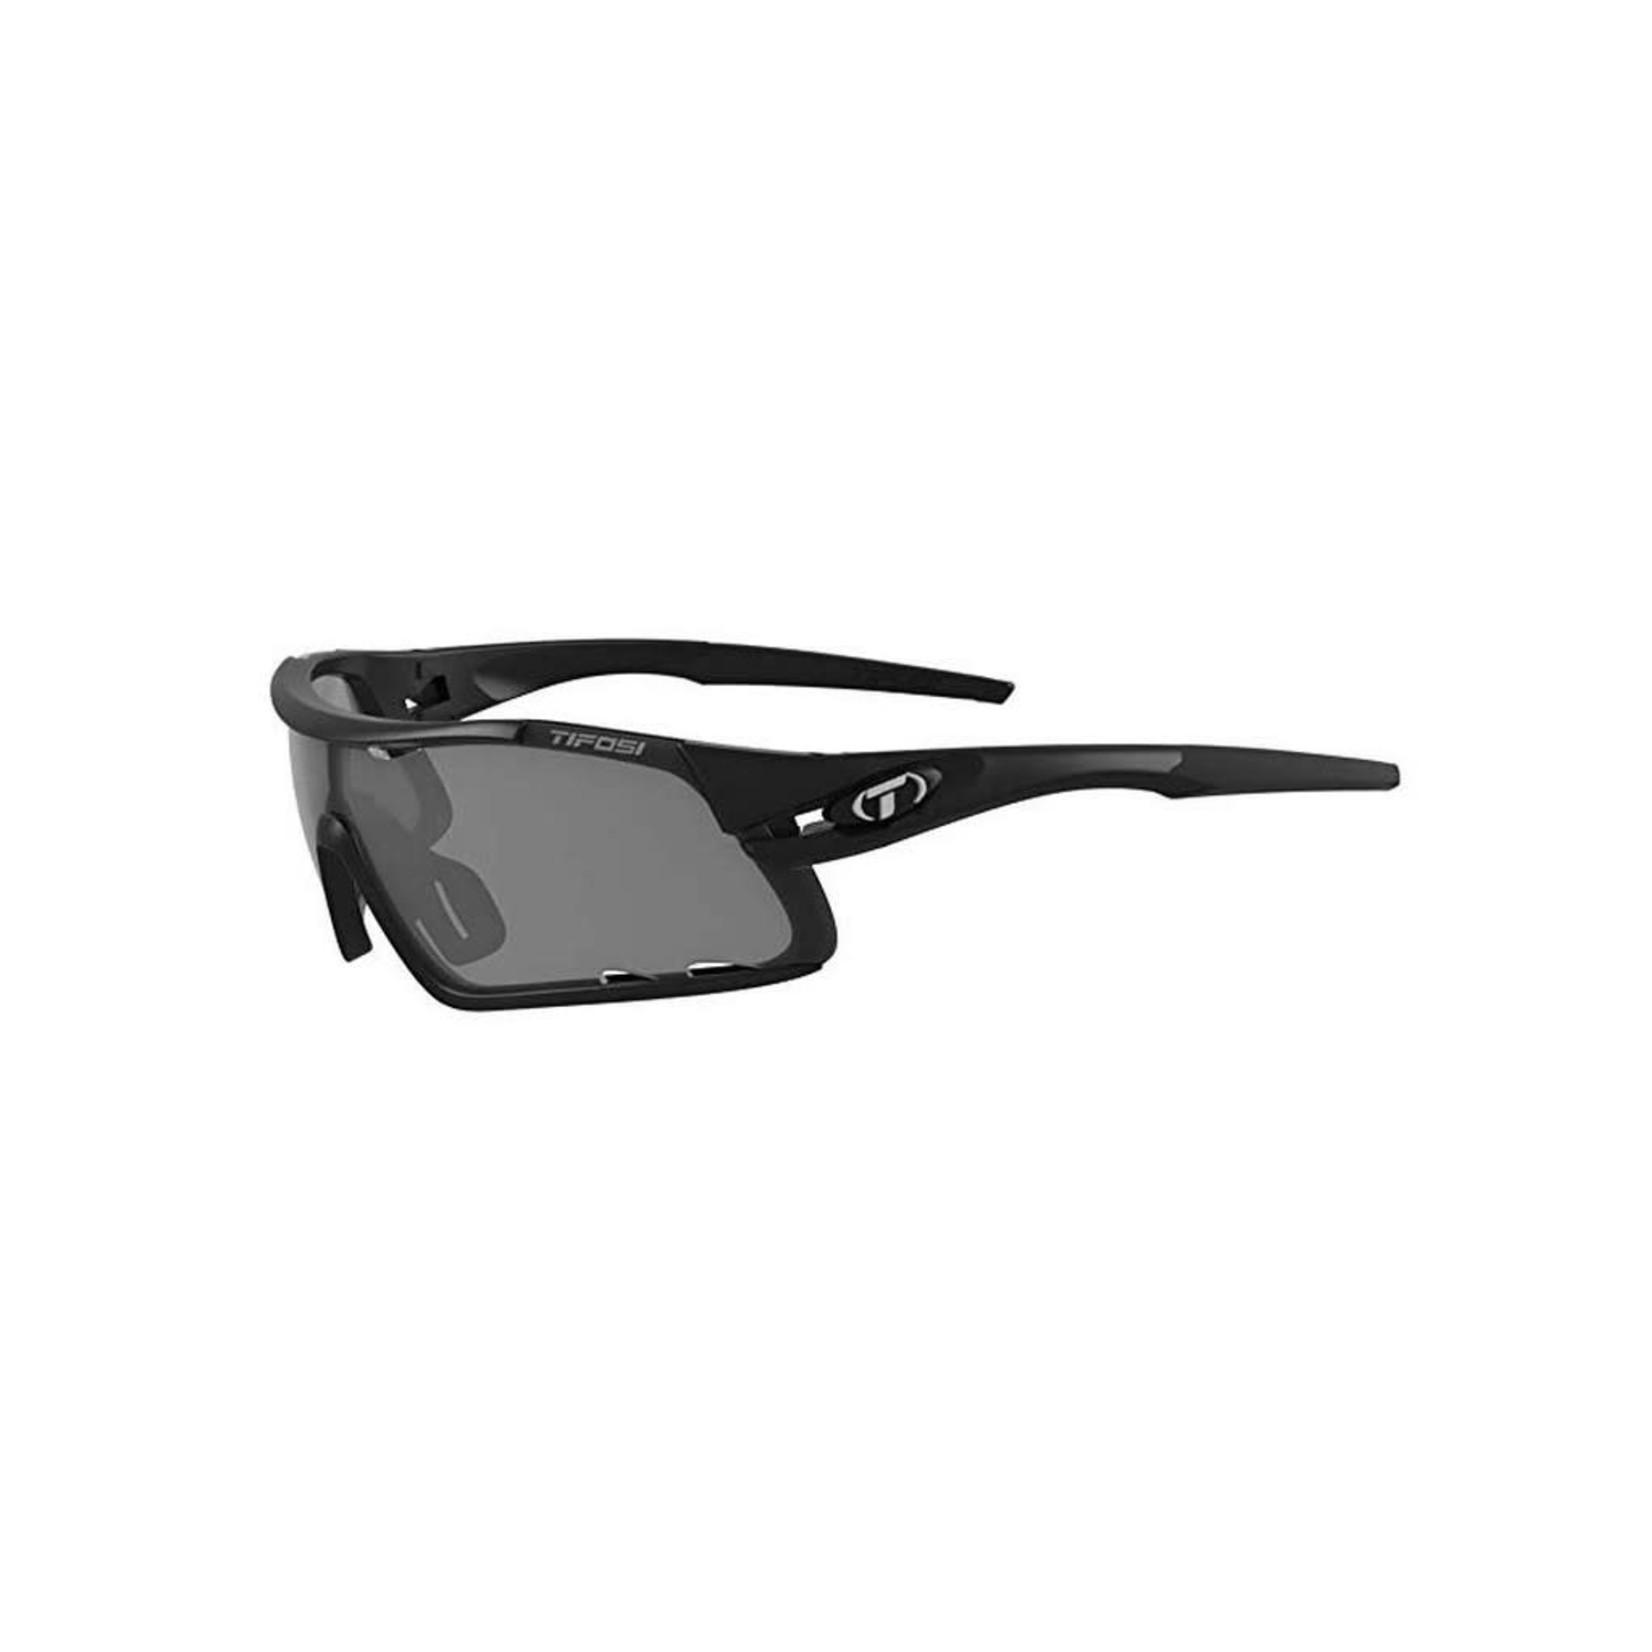 TIFOSI OPTICS Sunglasses Tifosi Davos Matte Black